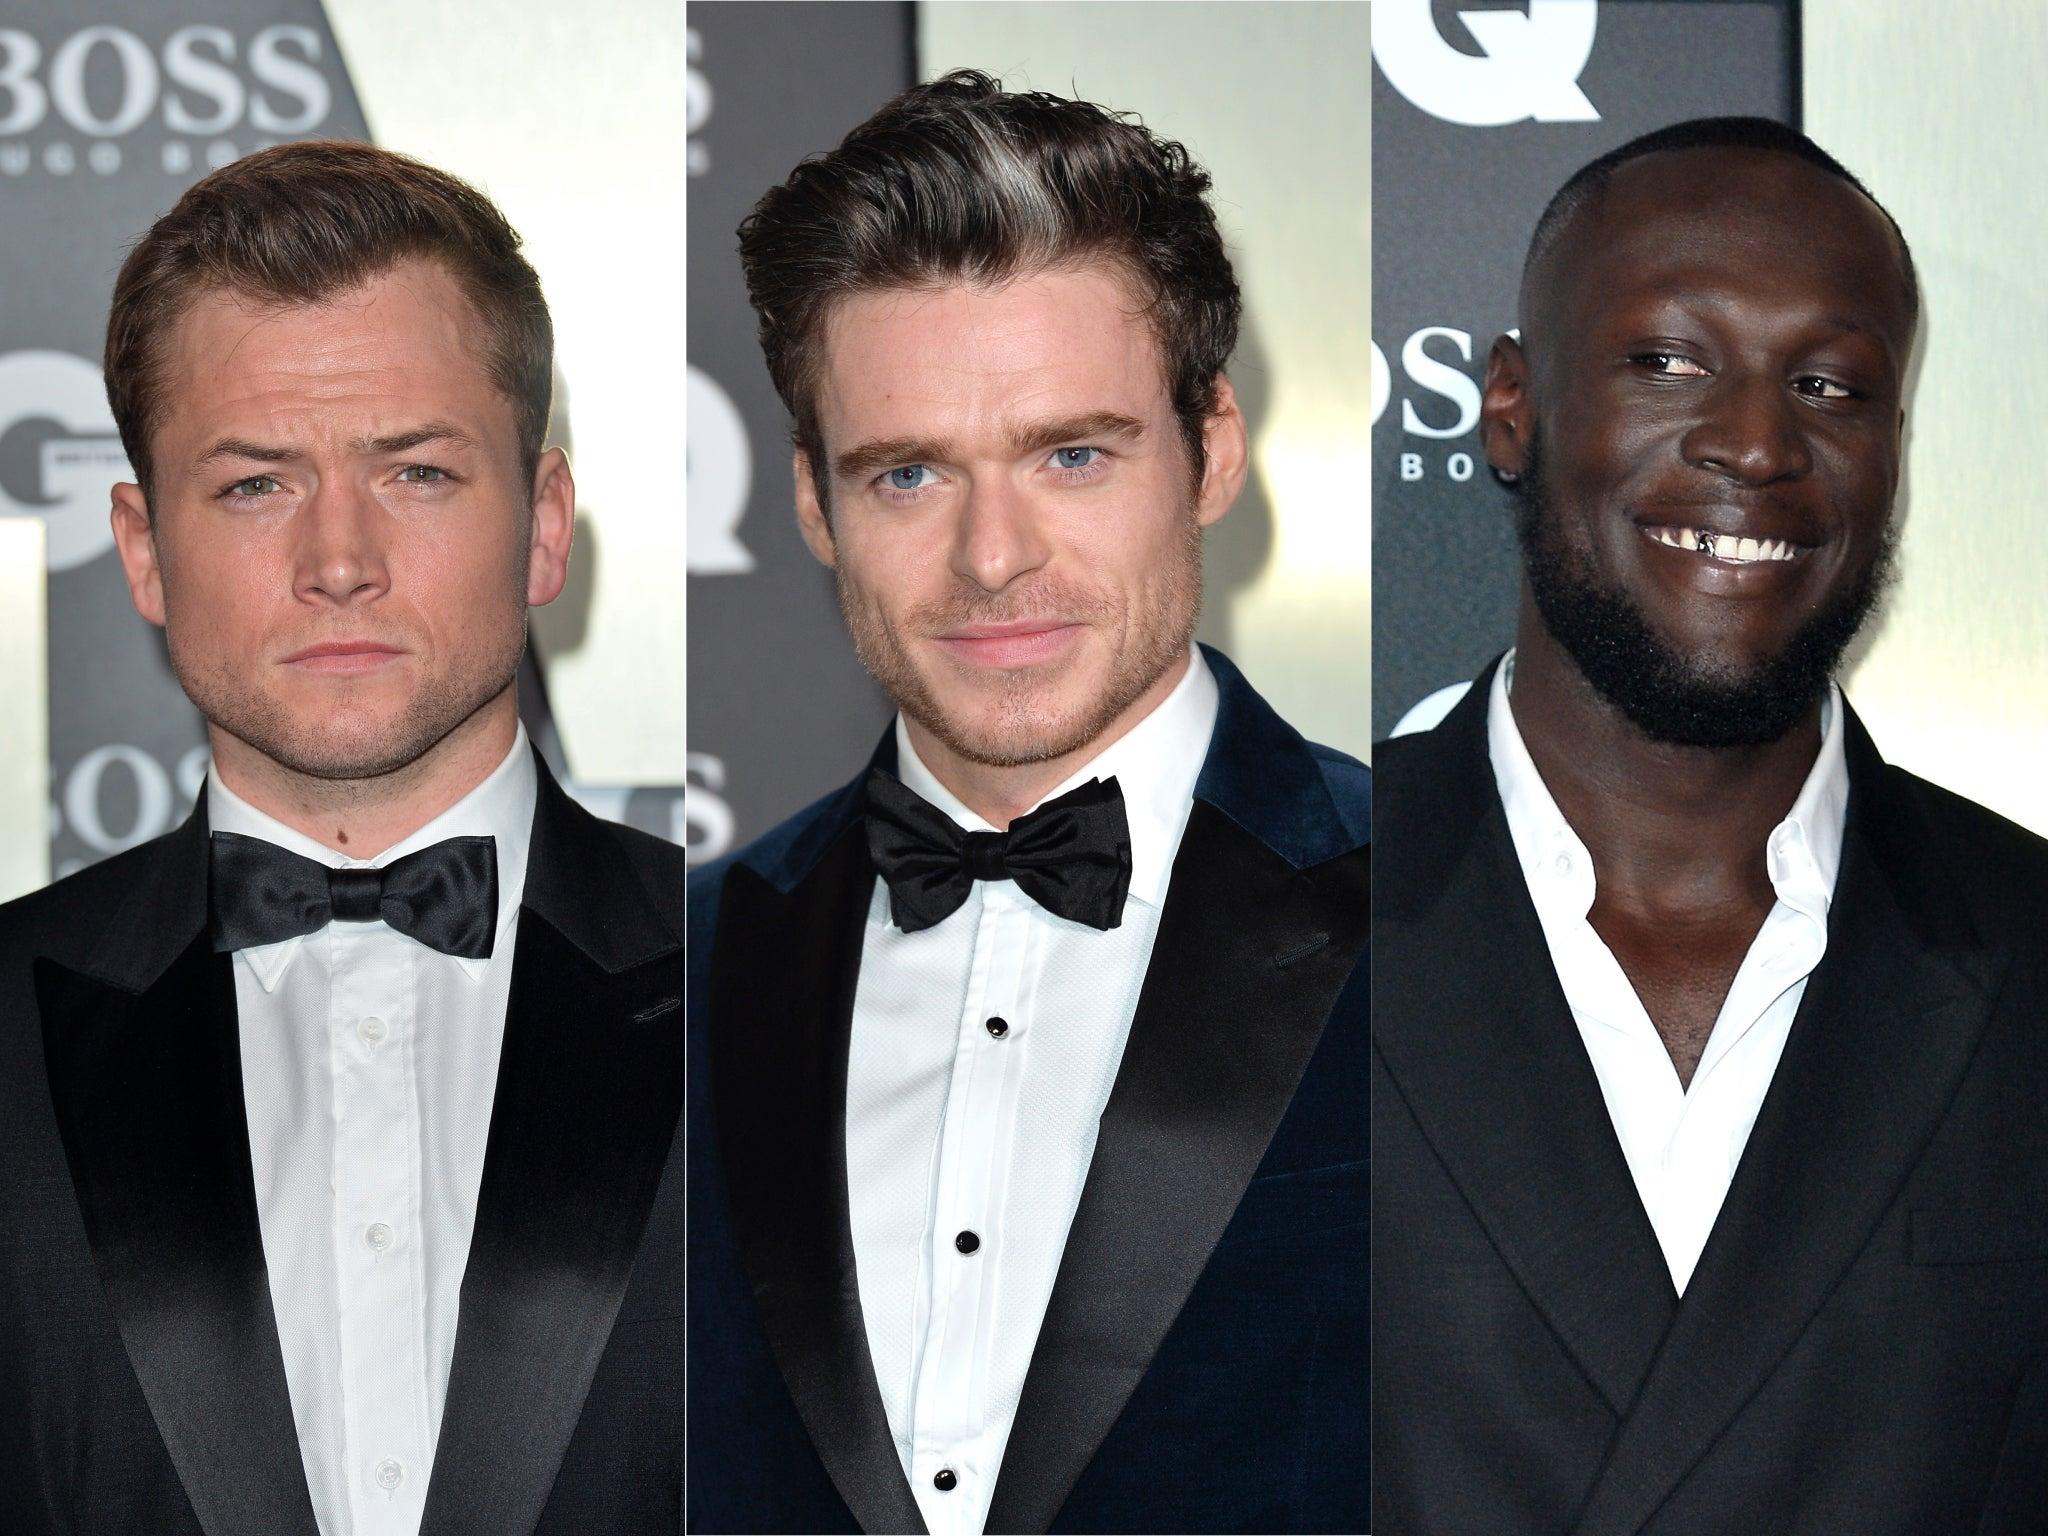 GQ Men of the Year Awards: Taron Egerton, Richard Madden and Andrew Scott win top prizes